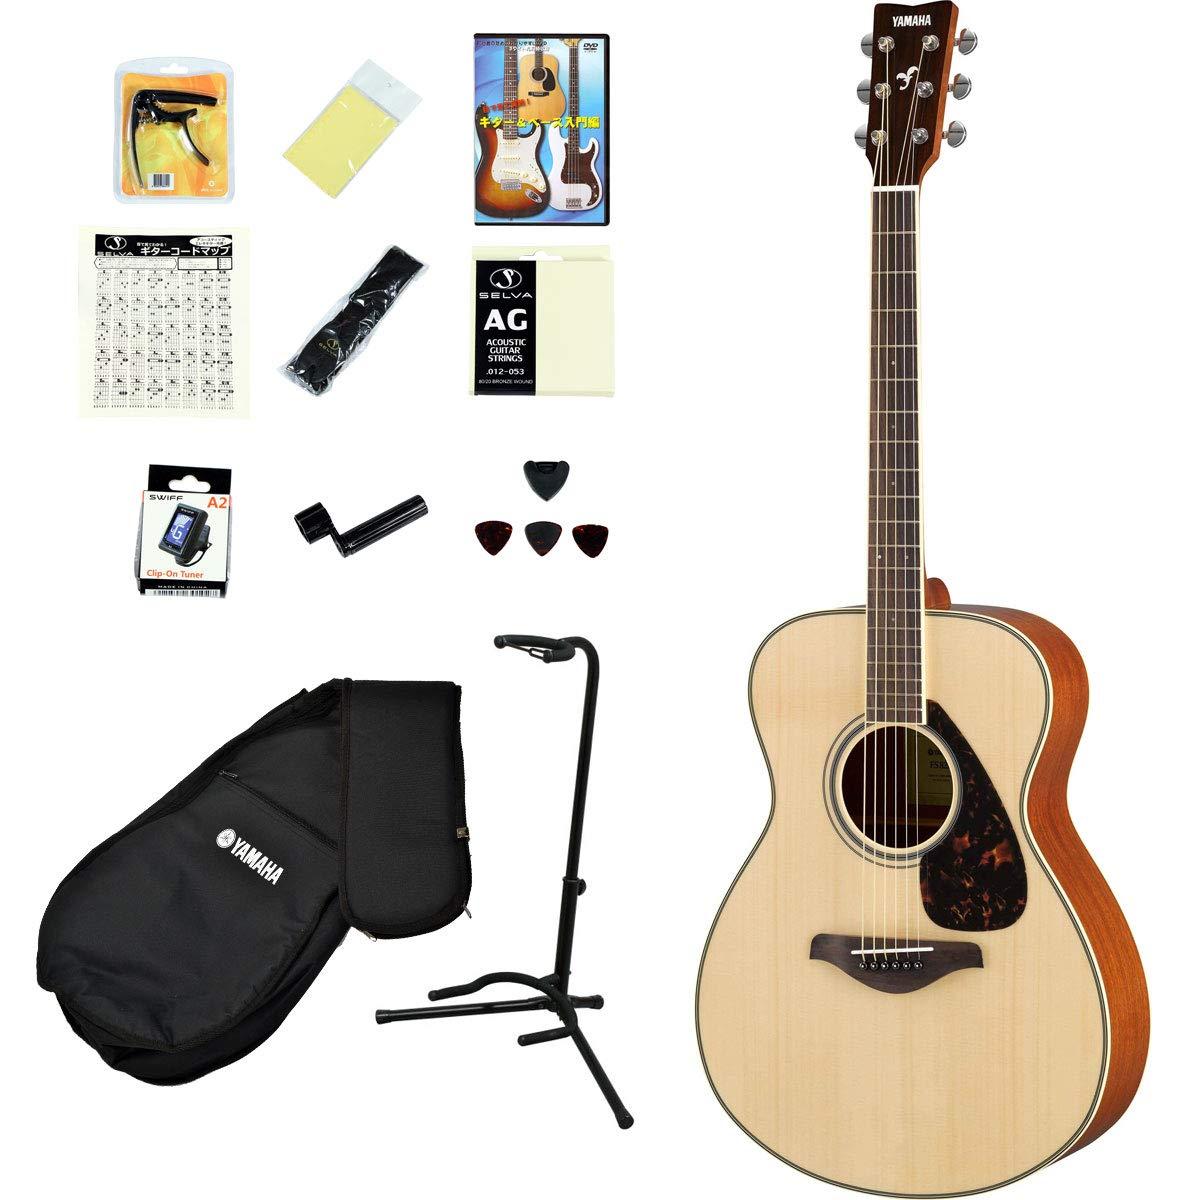 YAMAHA / FS820 NT 【アコースティックギター14点入門セット!】 FS-820 入門 初心者   B07NZPDL6K